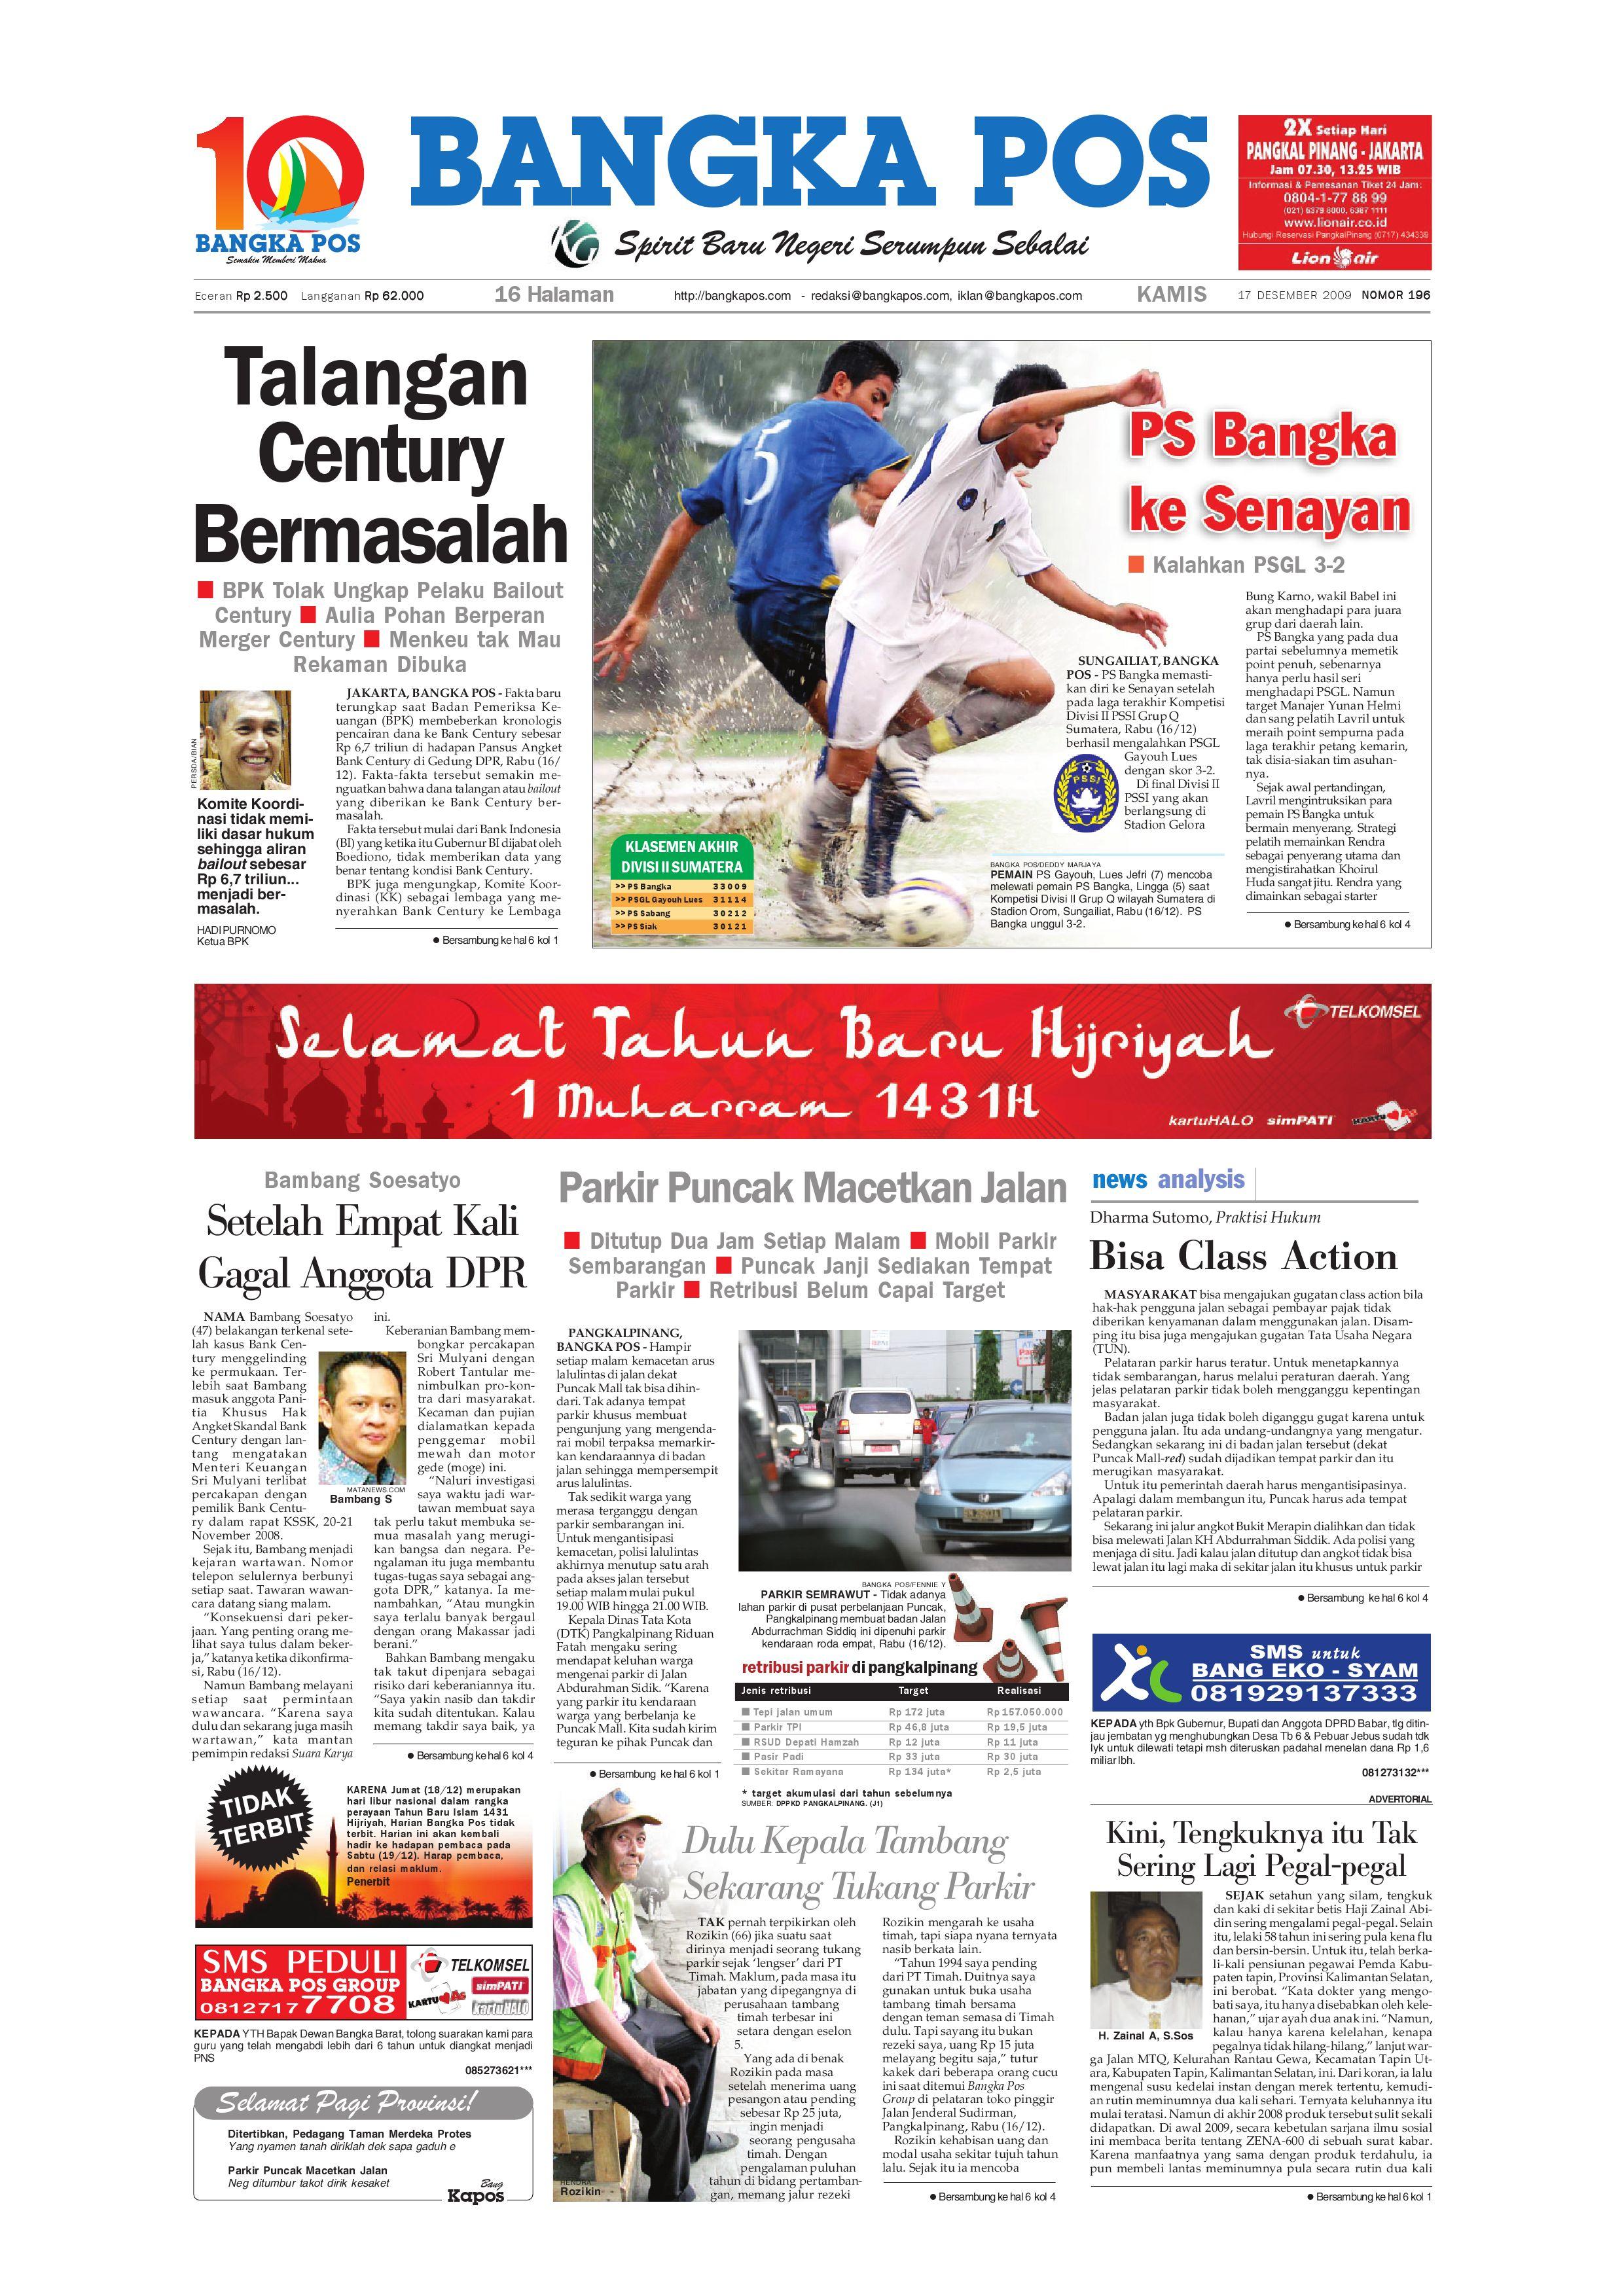 Harian Pagi Bangka Pos Edisi 17 Desember 2009 By Issuu Parcel Makanan Ampamp Keramik Pja 1608